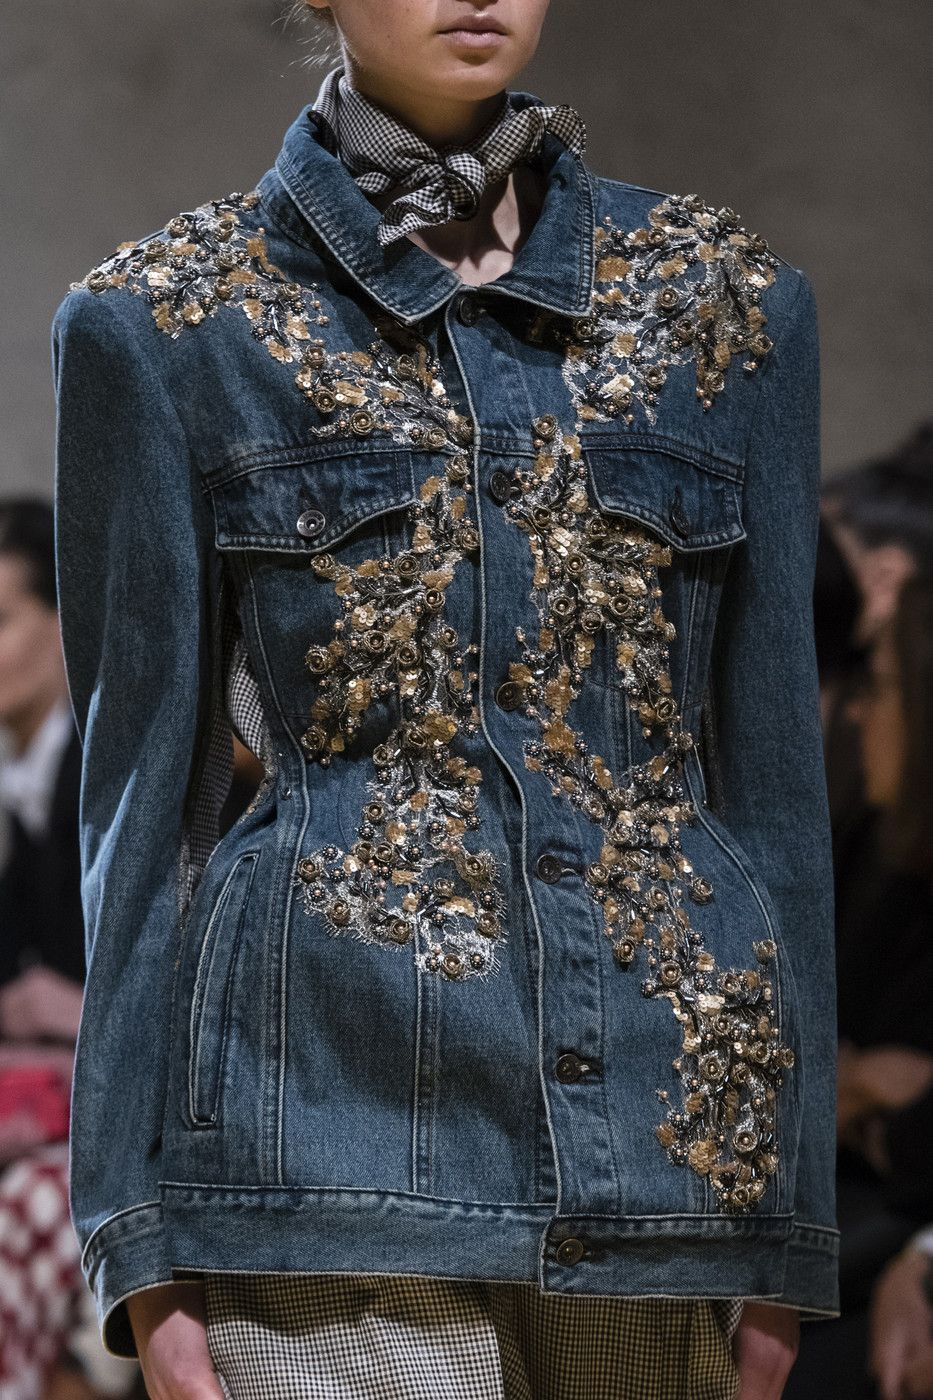 finest selection 0d1a0 4e7ab Antonio Marras at Milan Fashion Week Spring 2018 | Marras ...